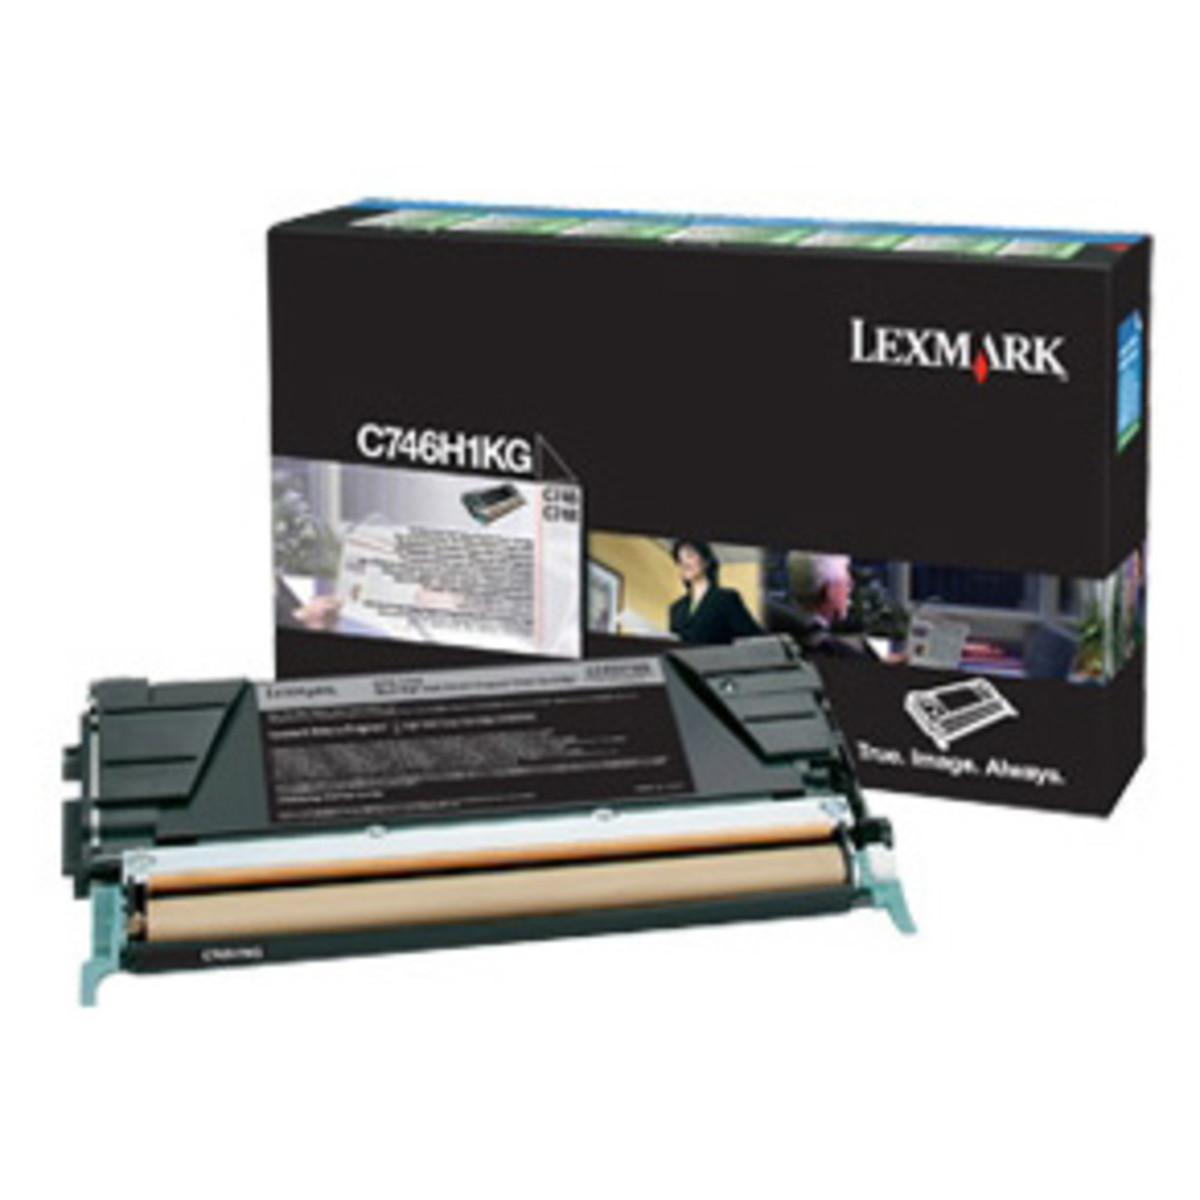 Lexmark C746H1KG Black Toner Cartridge